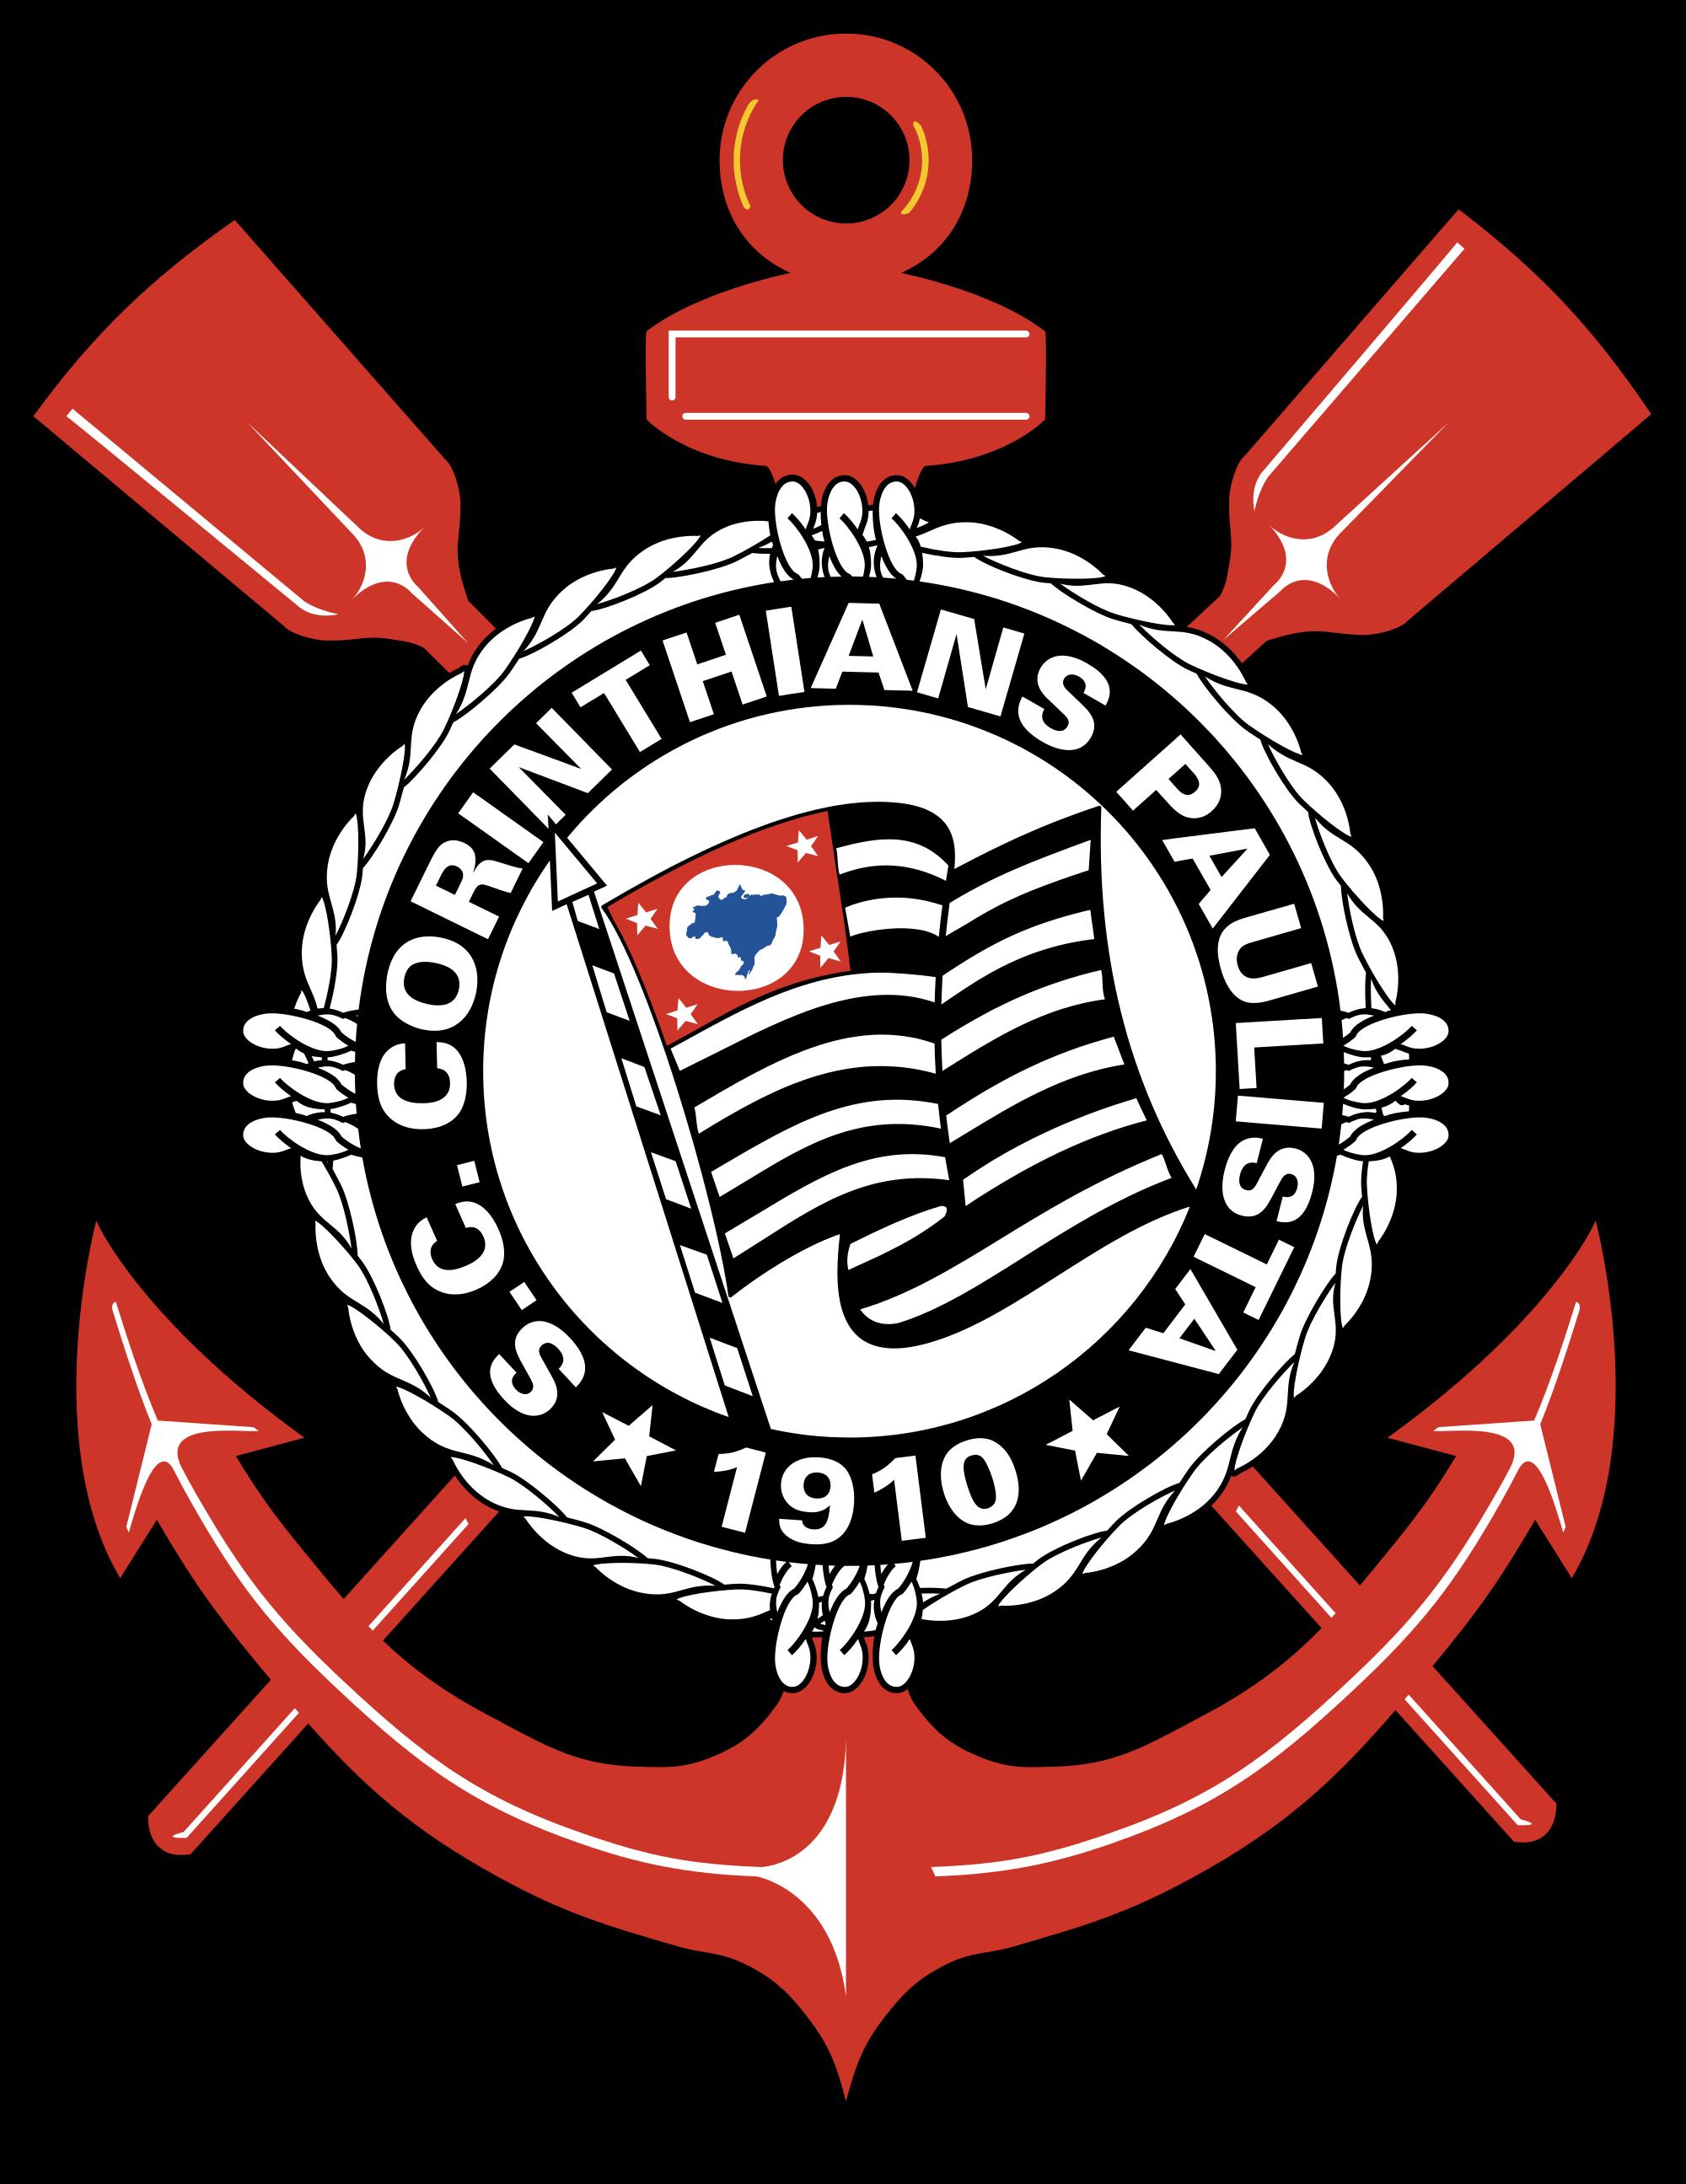 sport club corinthians s227o paulo brasil football